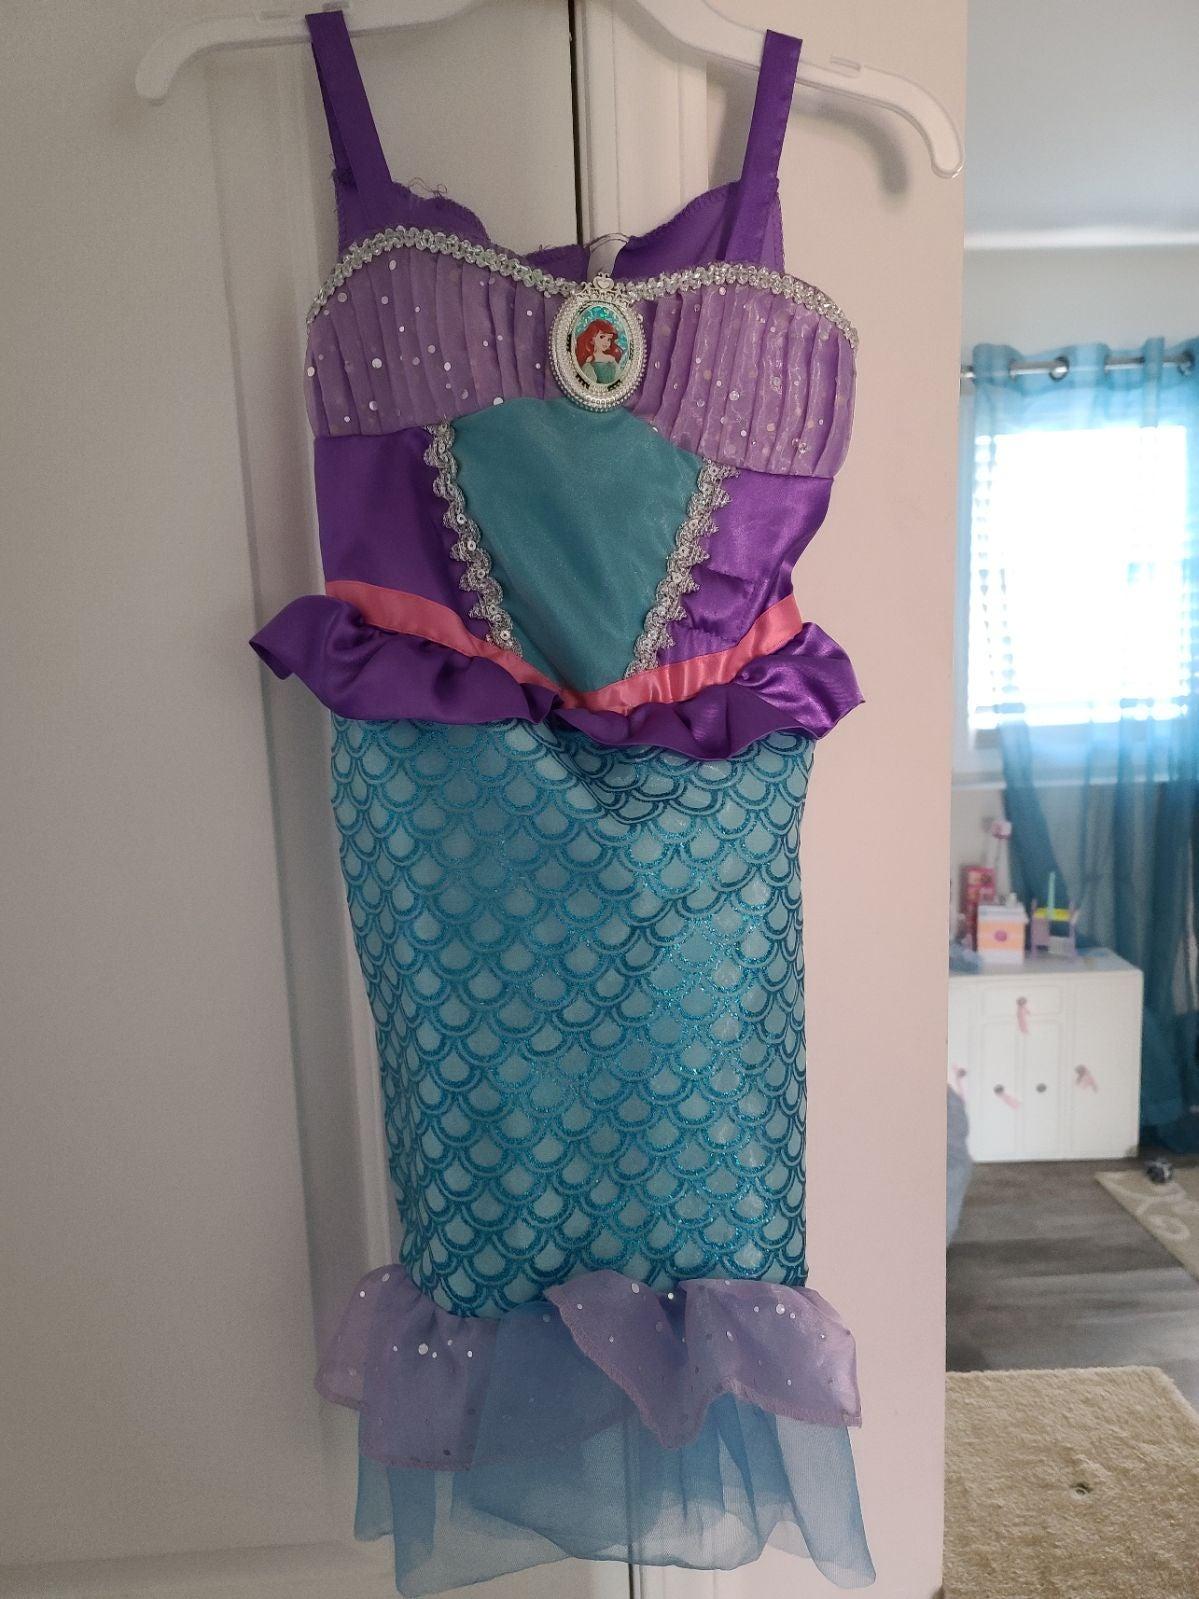 Disney Ariel dress up